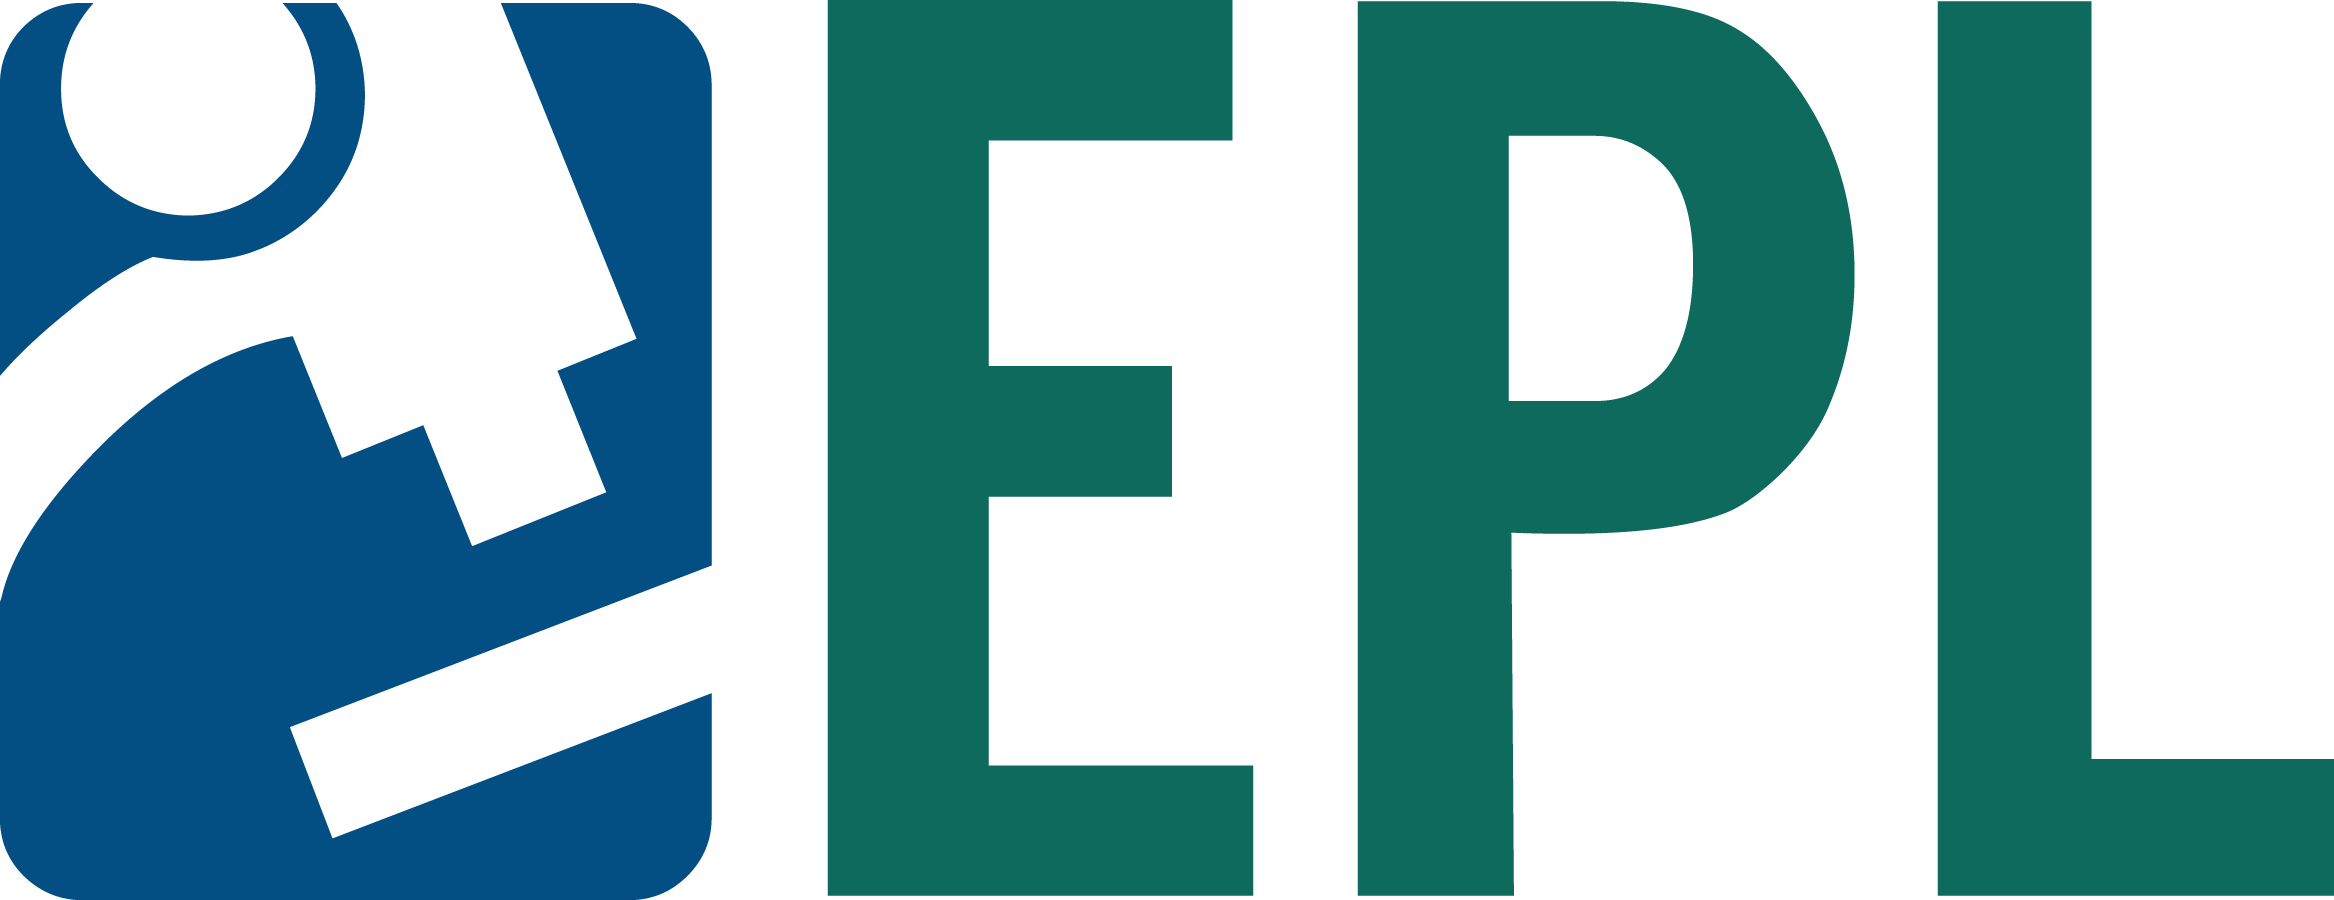 EPL, Inc.